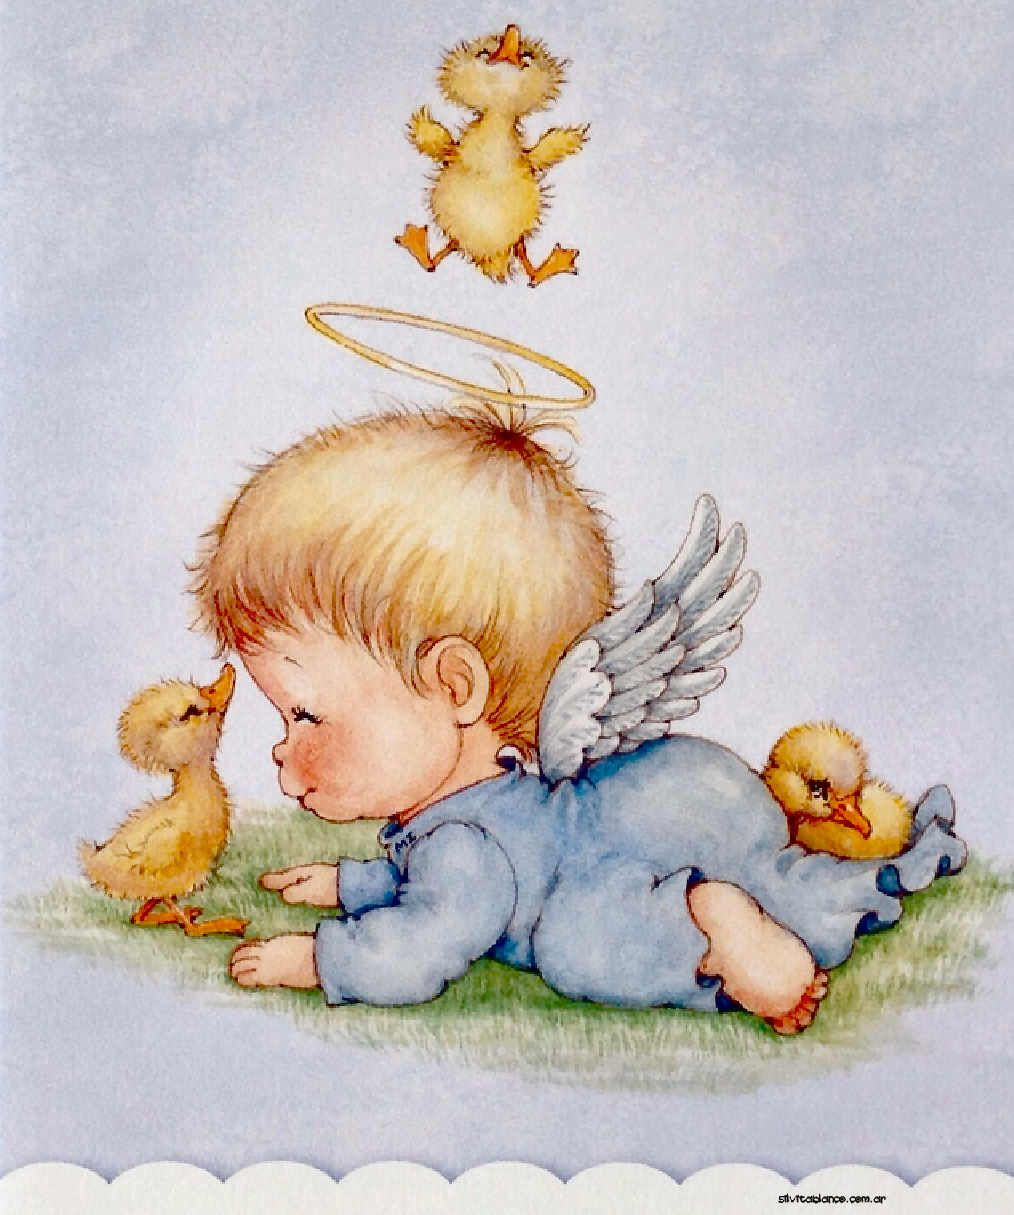 Meciendo Poema Gabriela Mistral Dibujos Bonitos Arte De Angel Cosas Lindas Para Dibujar